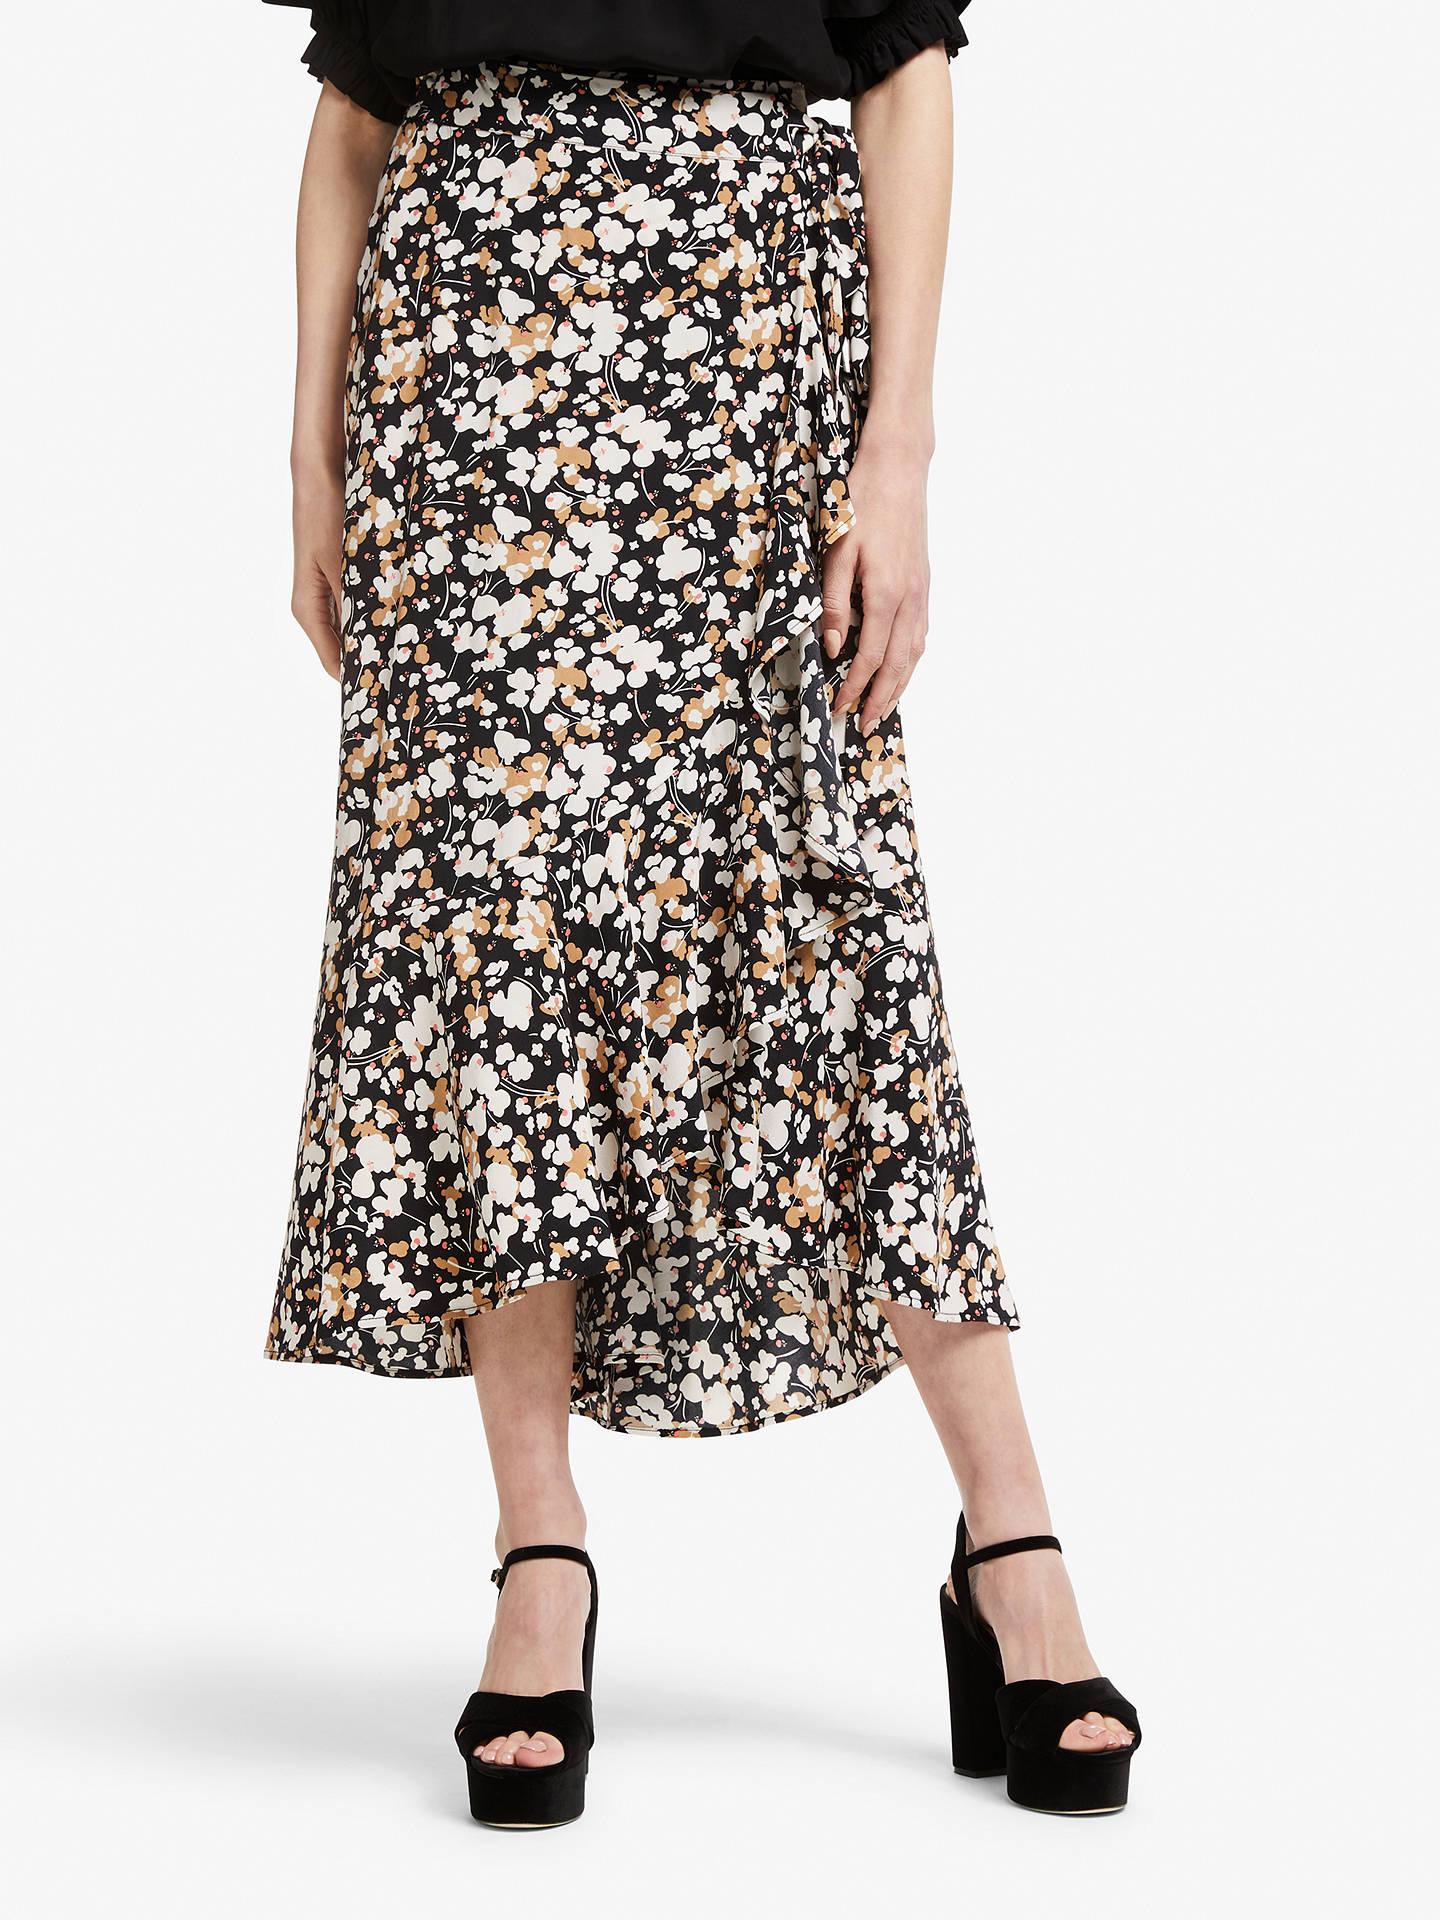 2815fb5469aa Buy Somerset by Alice Temperley Dapple Apple Frill Wrap Skirt,  Black/Neutral, 10 ...